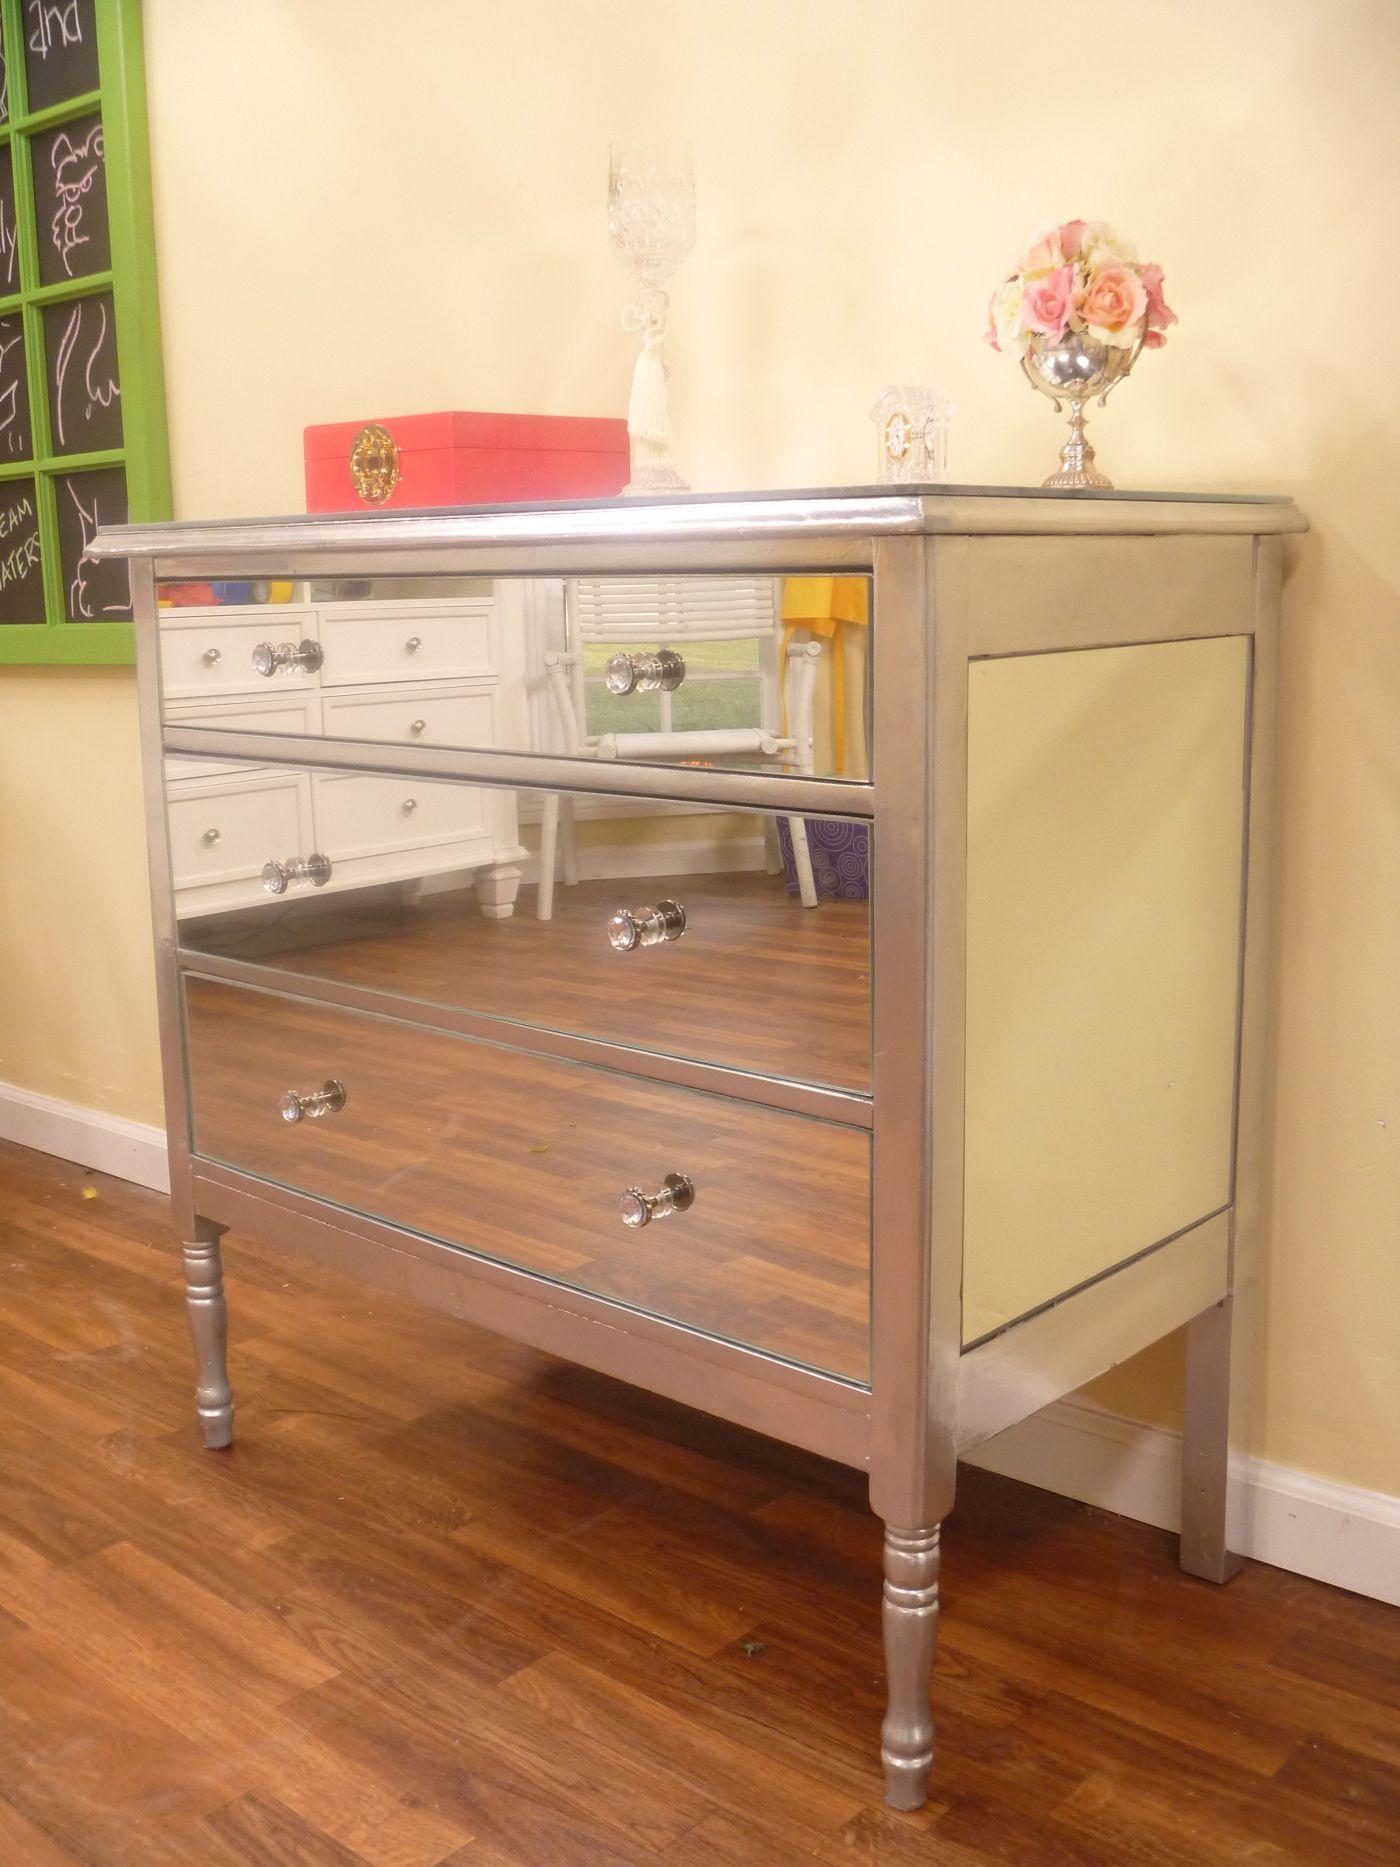 DIY Mirrored Dresser | Diy mirrored furniture, Mirrored ...